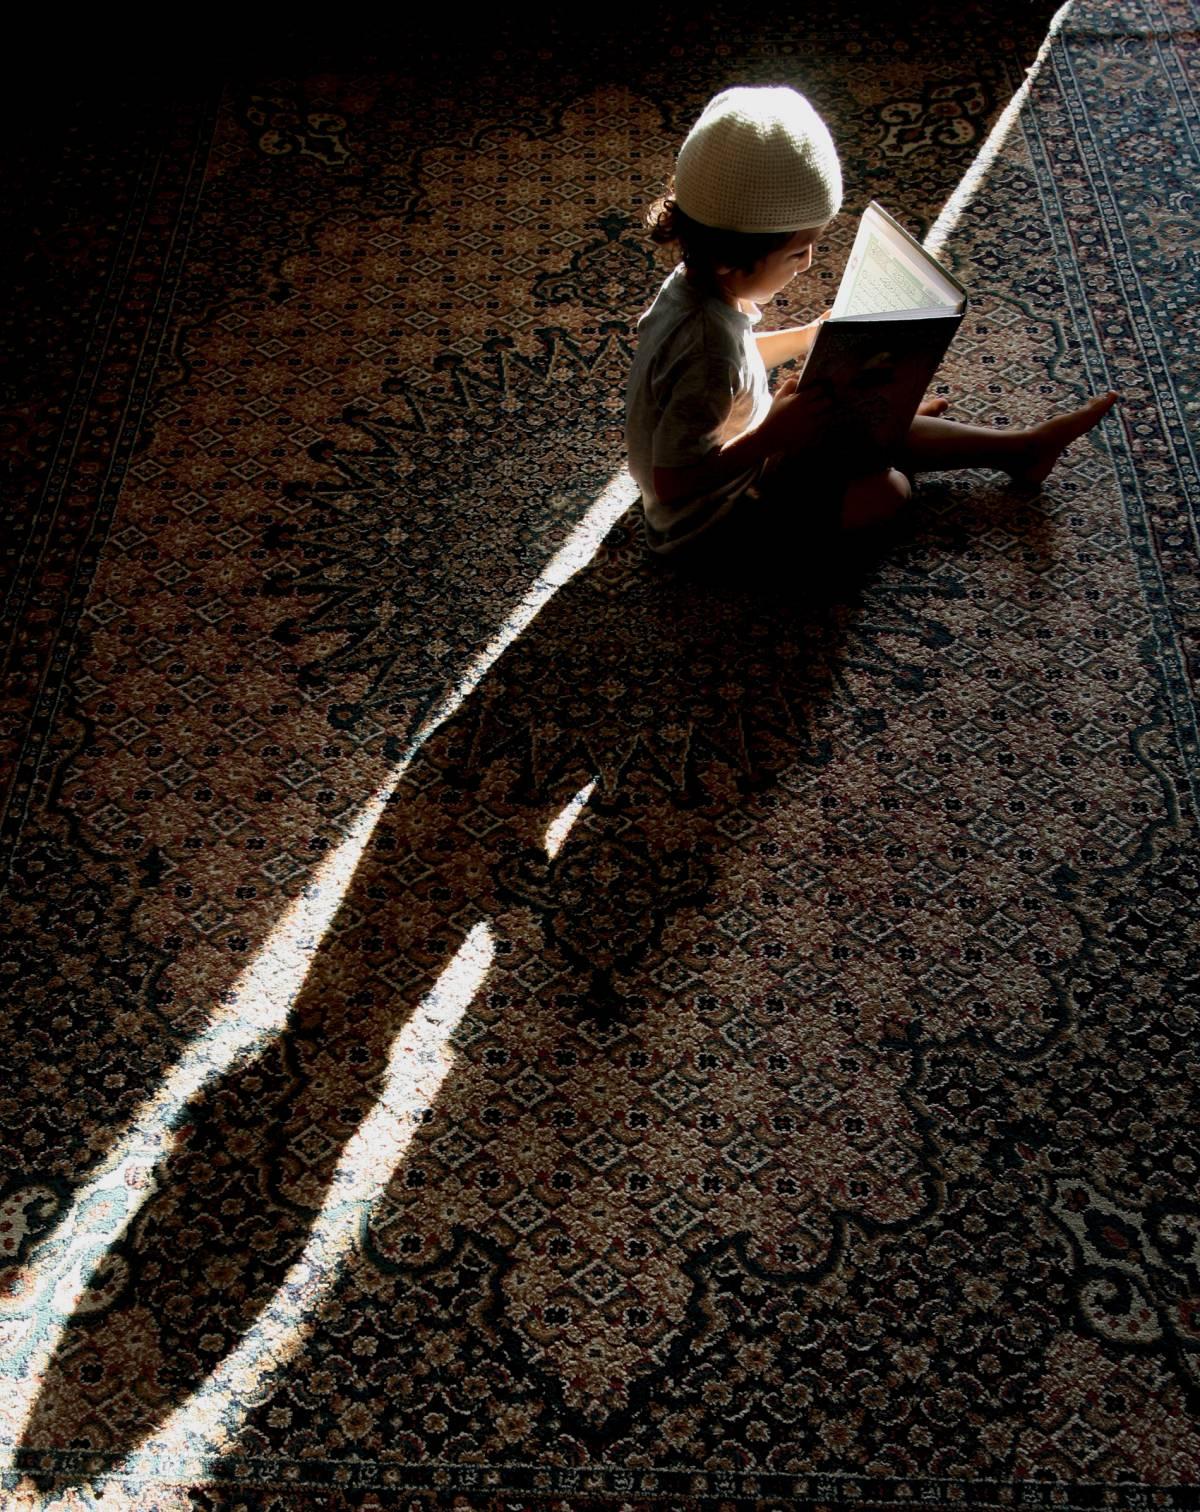 La lingua del Corano inganna i musulmani